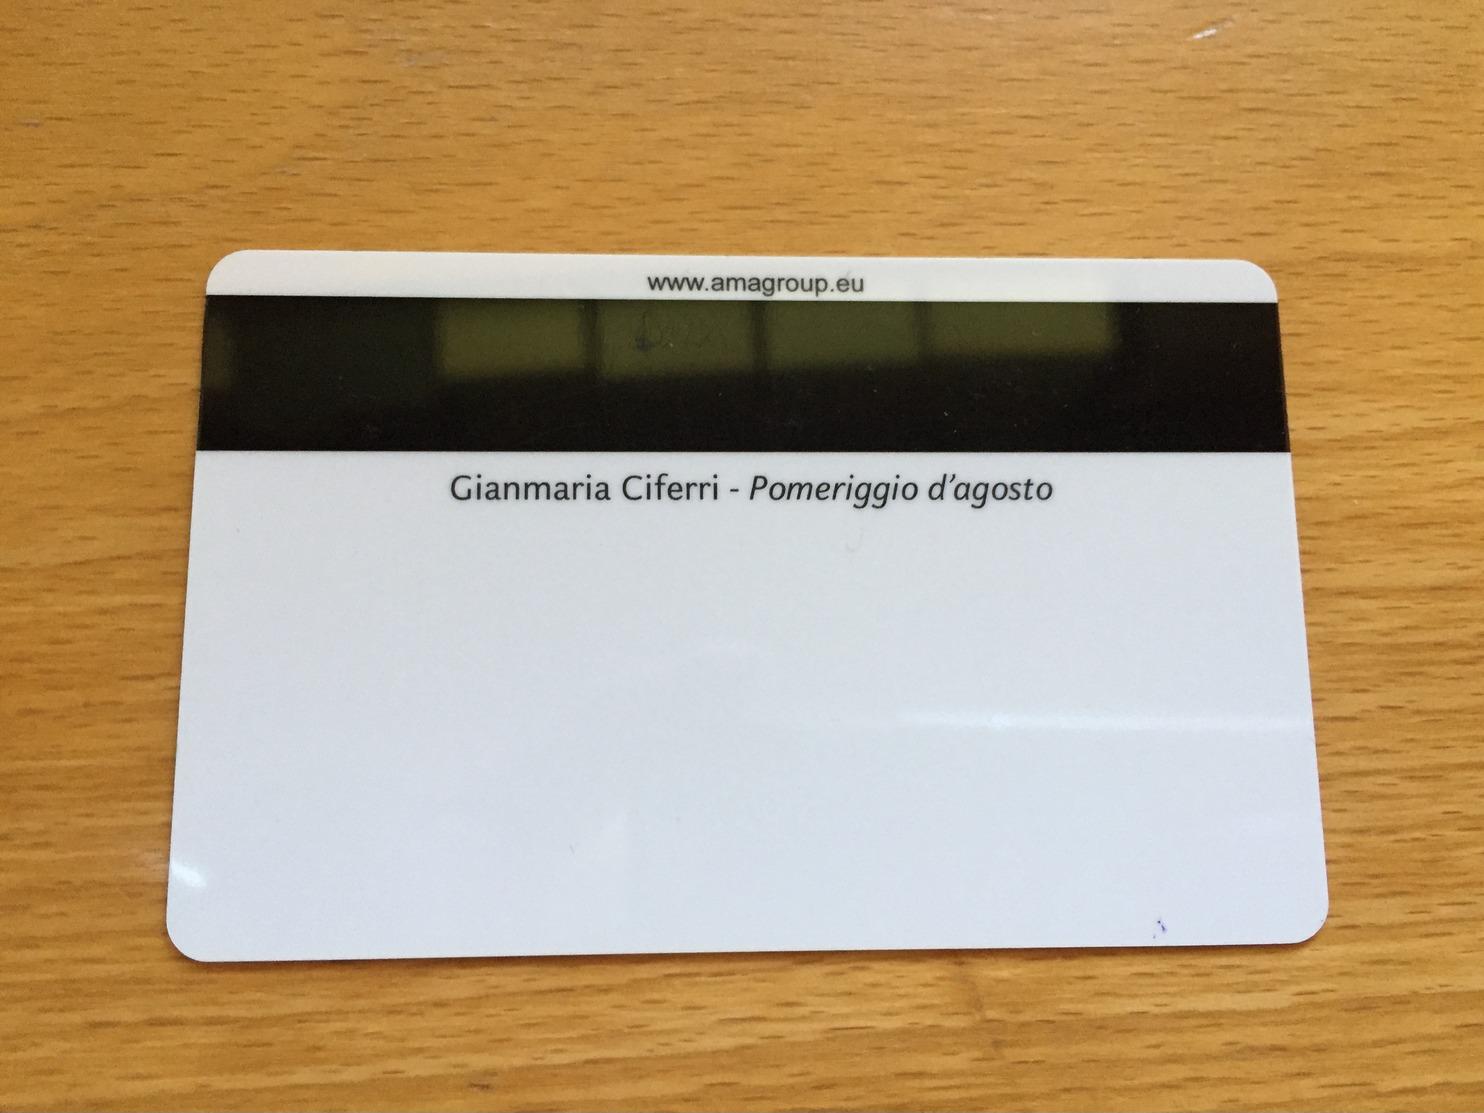 Hotelkarte Room Key Keycard Clef De Hotel Tarjeta Hotel CABIN CARD  COSTA NEOROMANTICA AMBRA - Telefonkarten